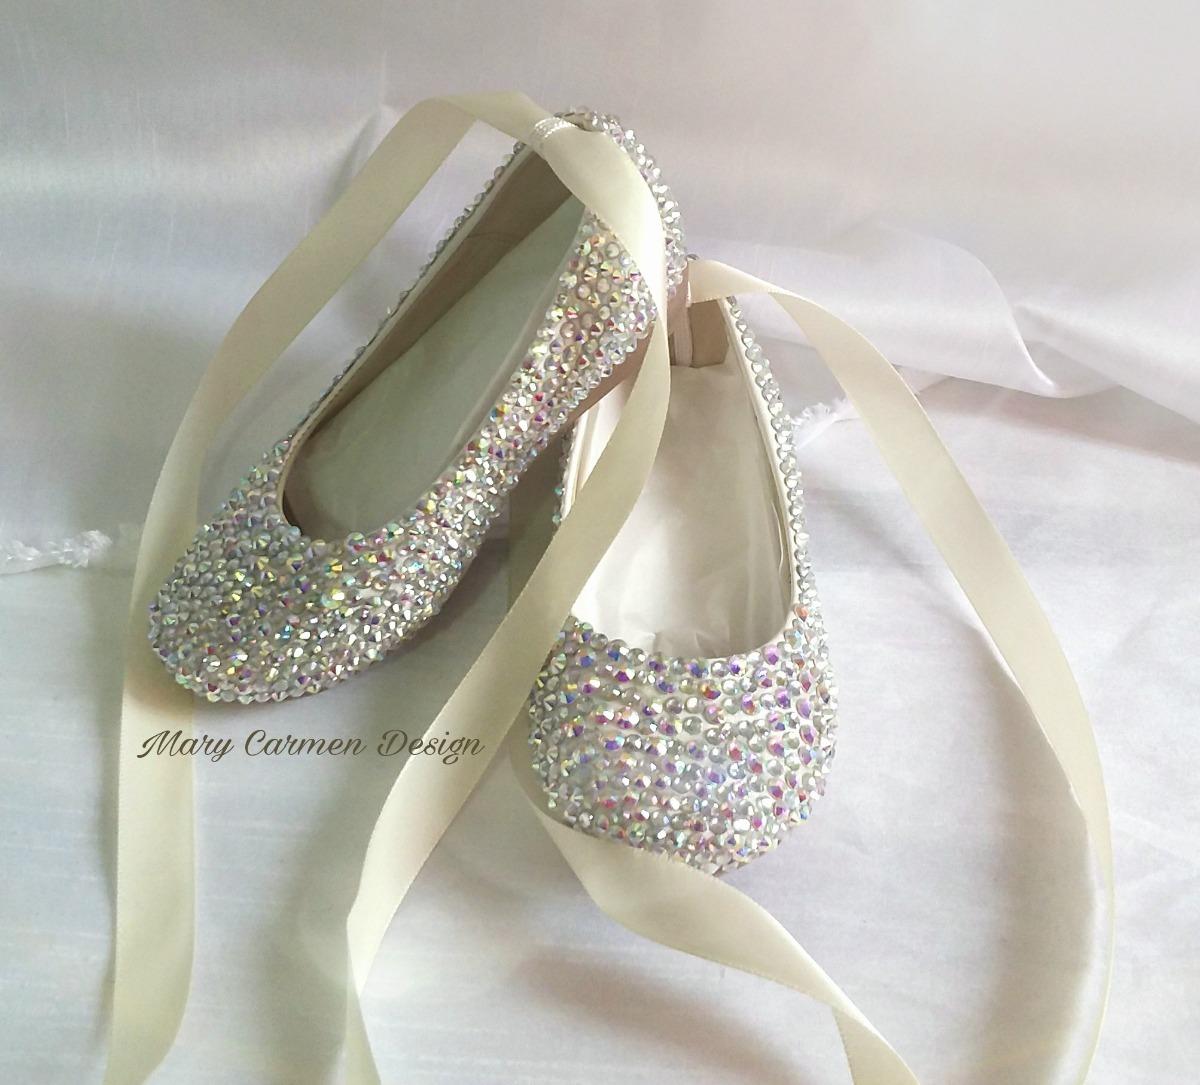 39a2d8897b1 Hermosos zapatos flats bautizo primera comunión cristales cargando zoom jpg  1200x1085 Cristal zapatos primera comunion